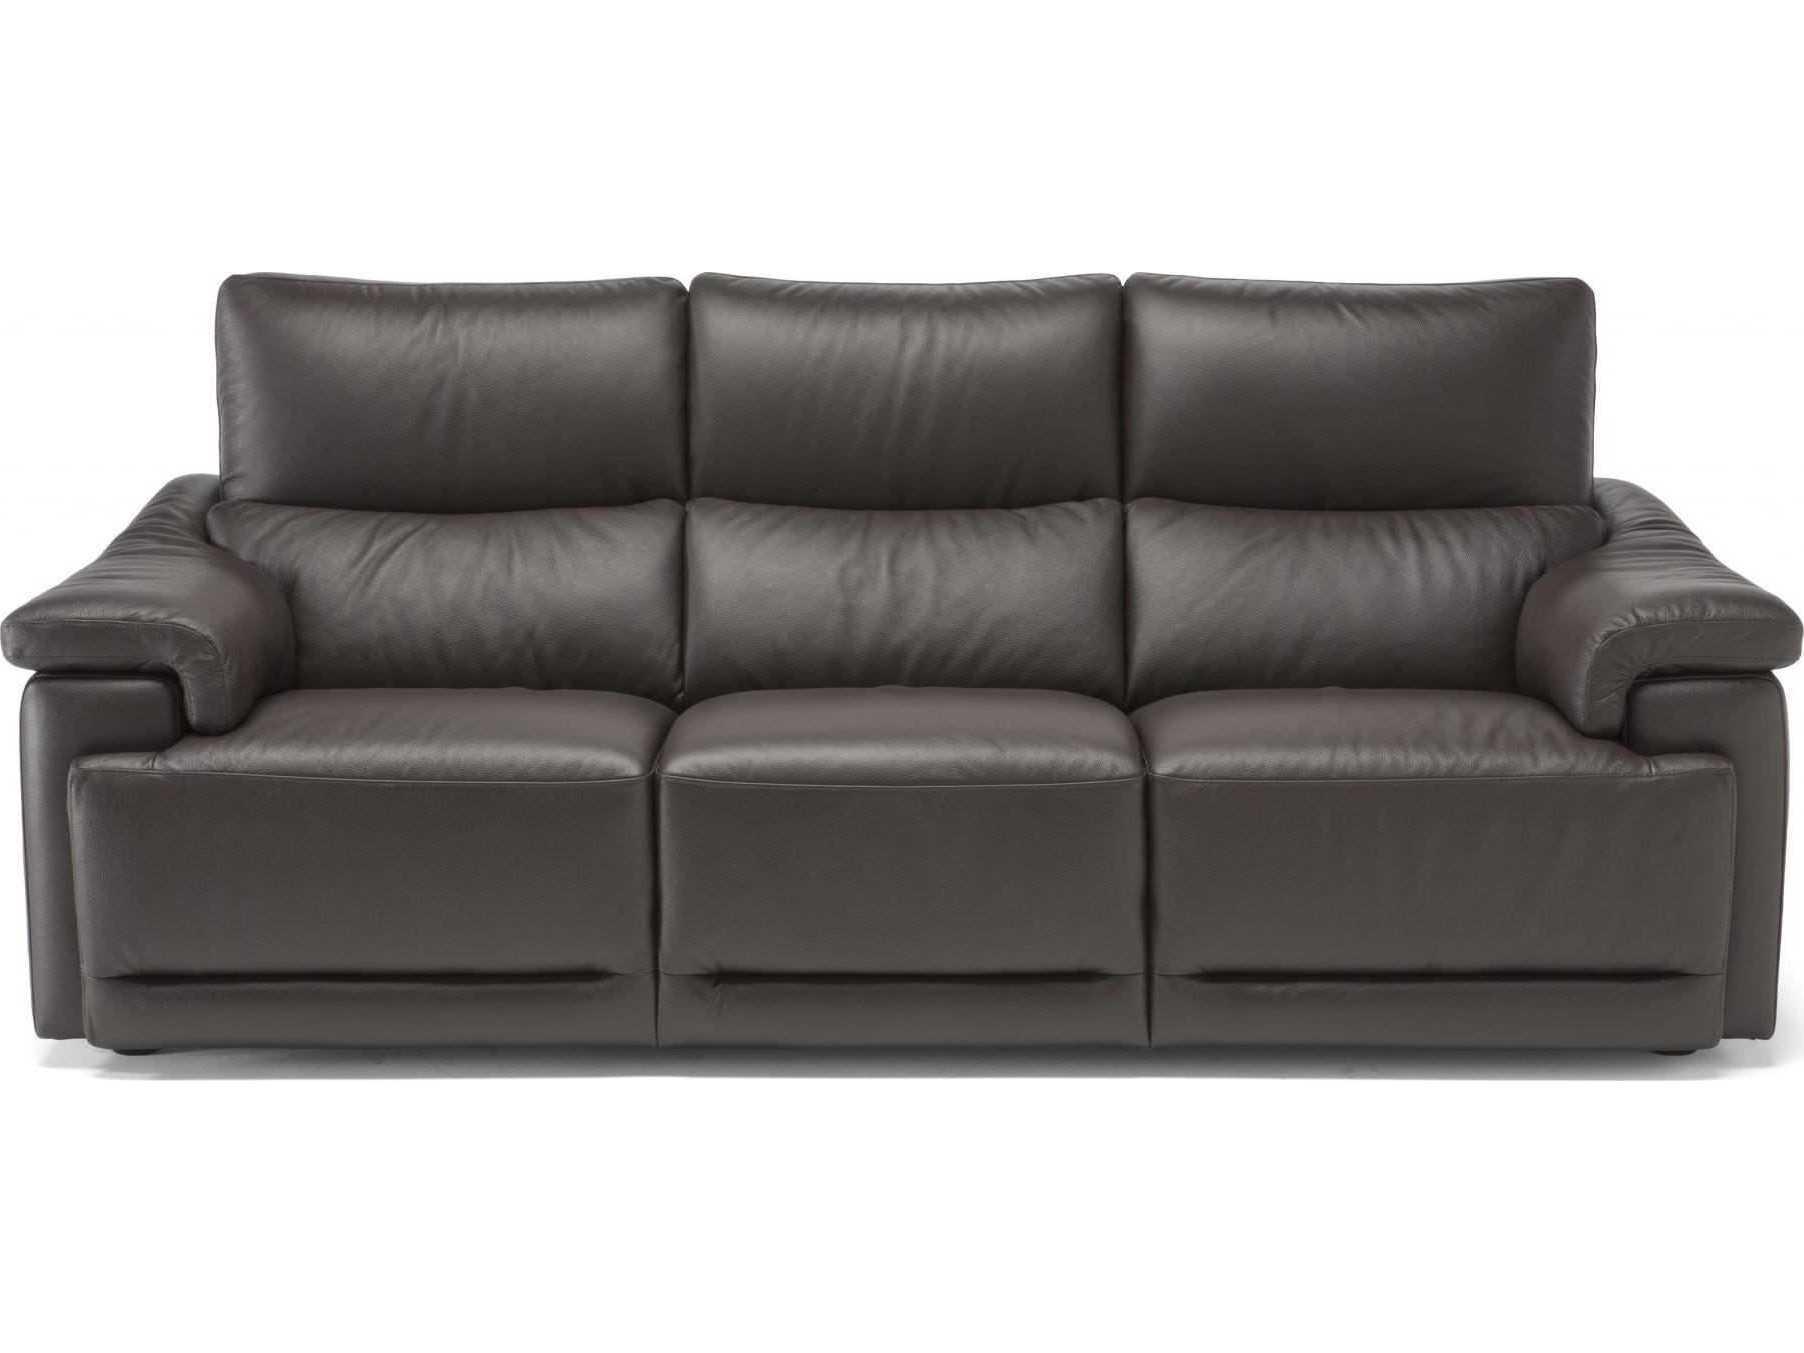 Natuzzi Editions Brama Sofa Couch Ntzc070064